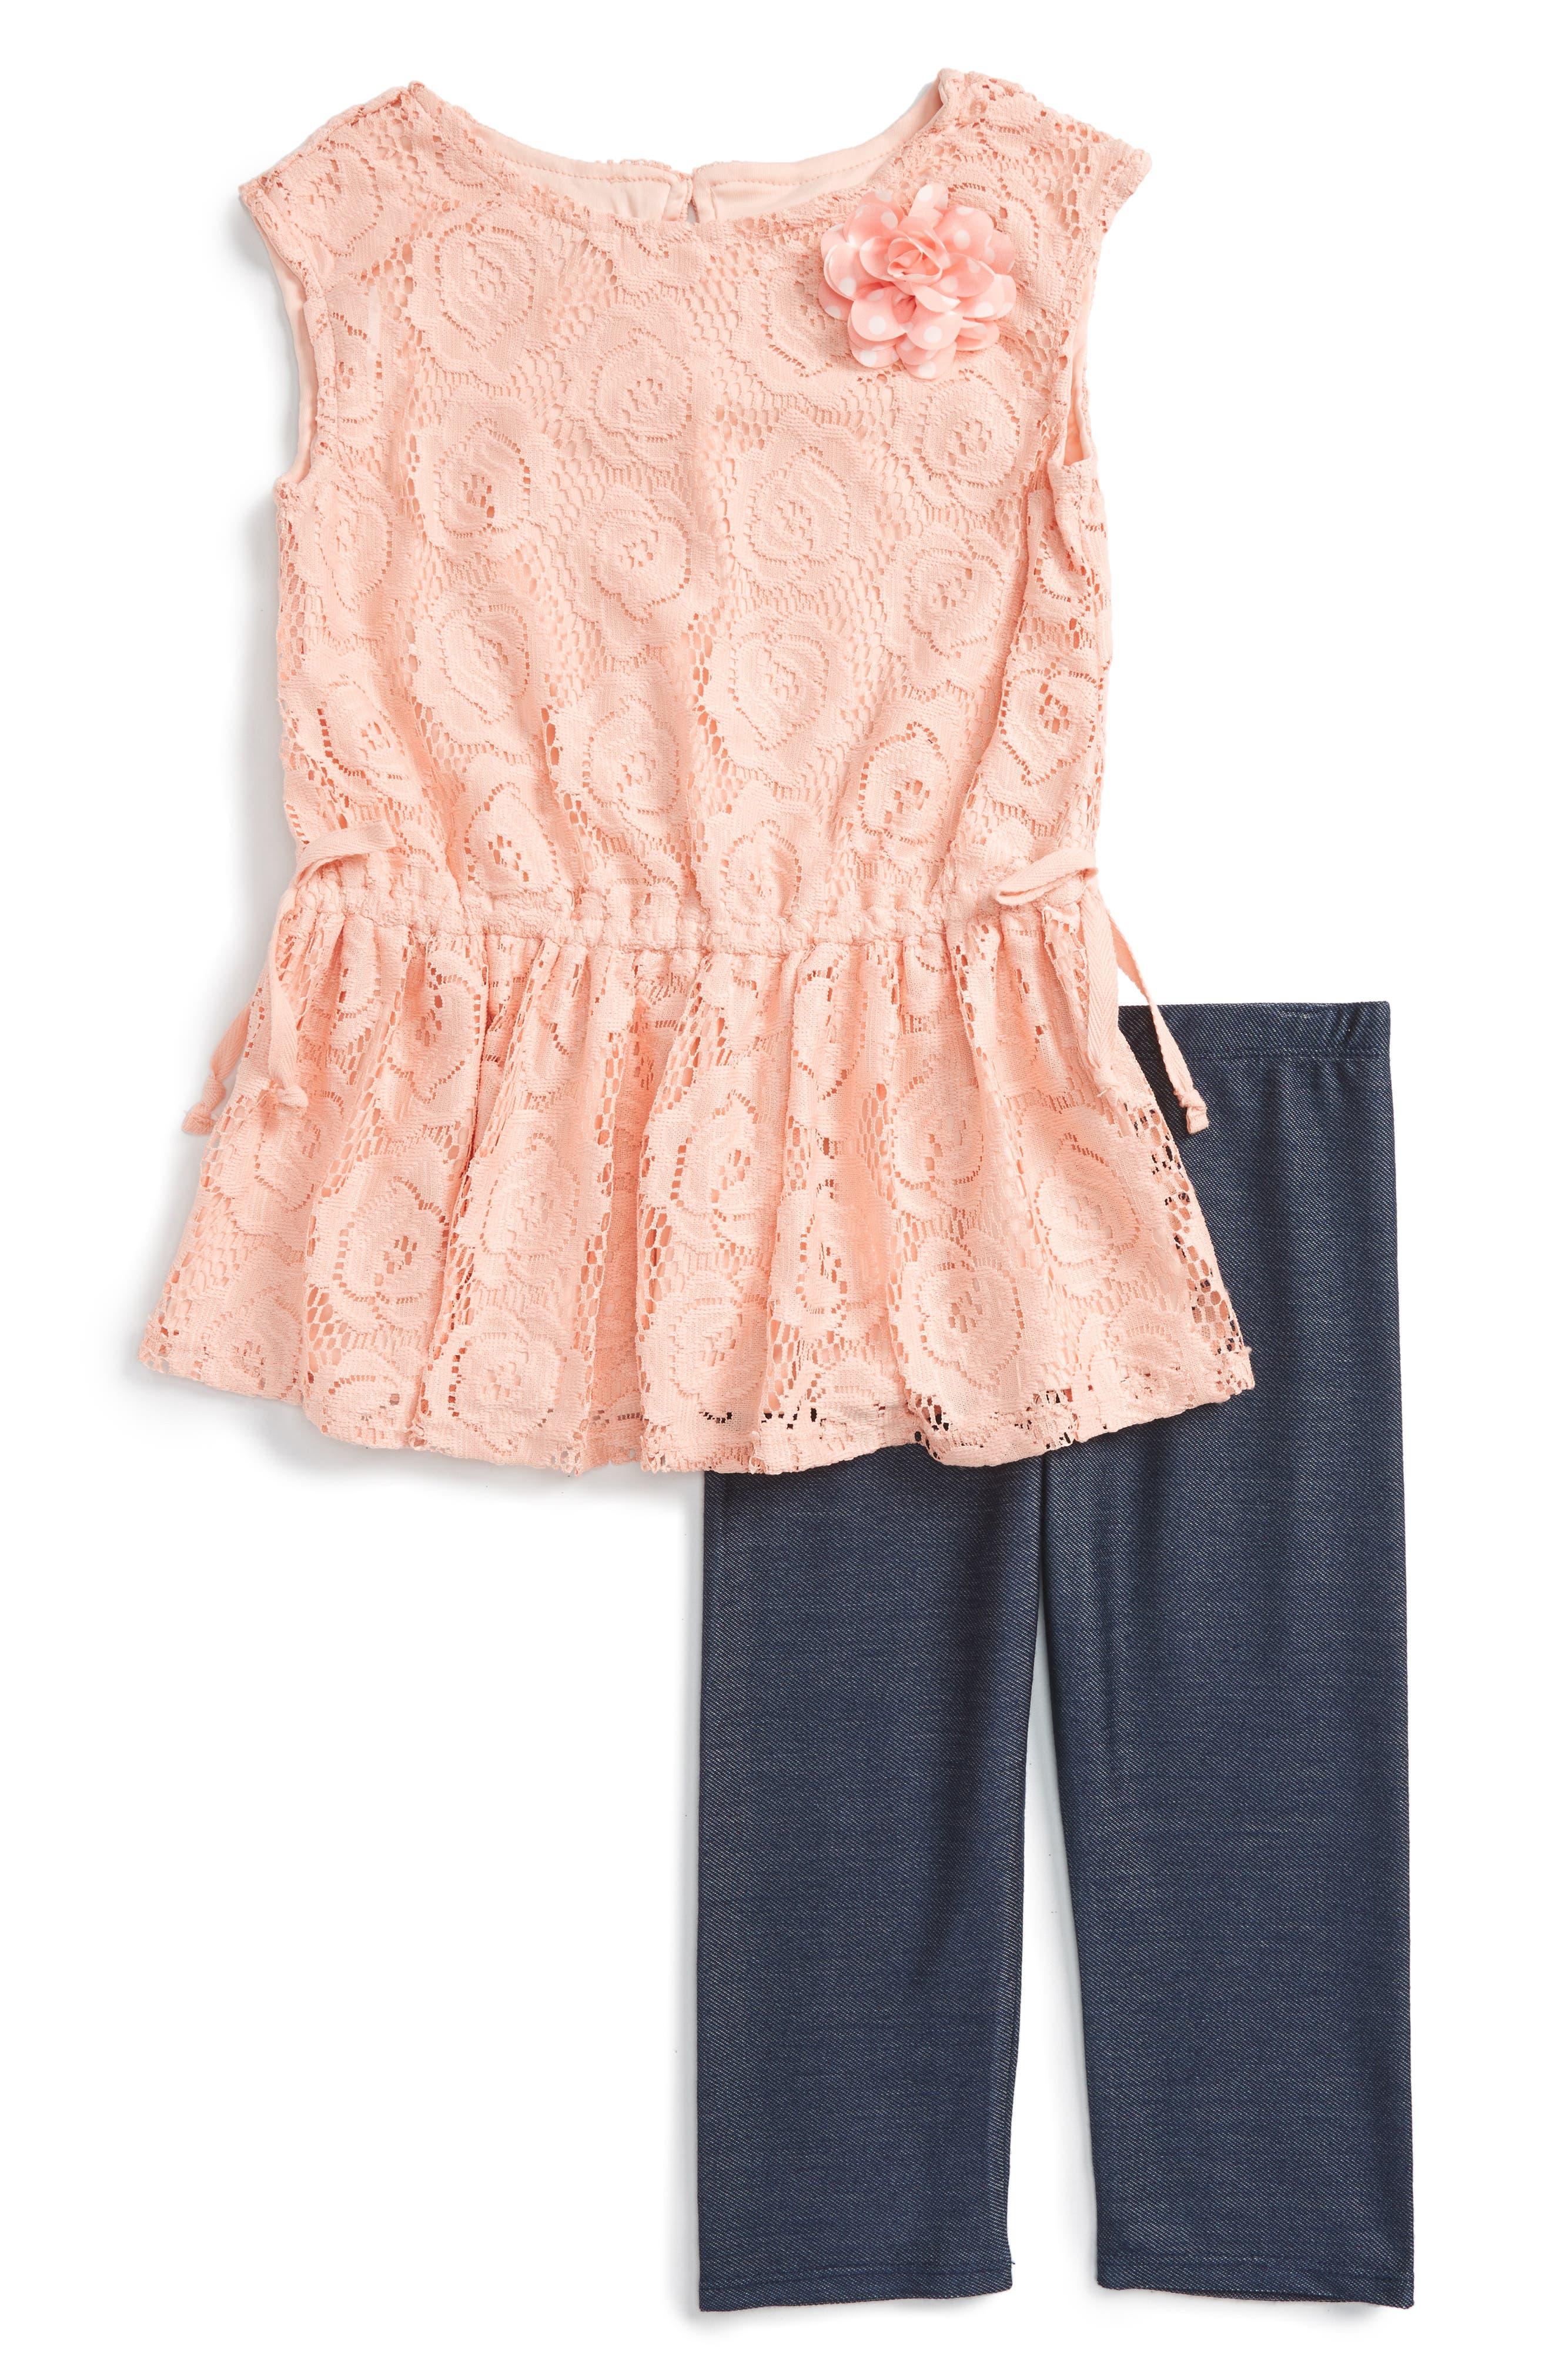 PIPPA & JULIE Lace Tunic & Leggings Set